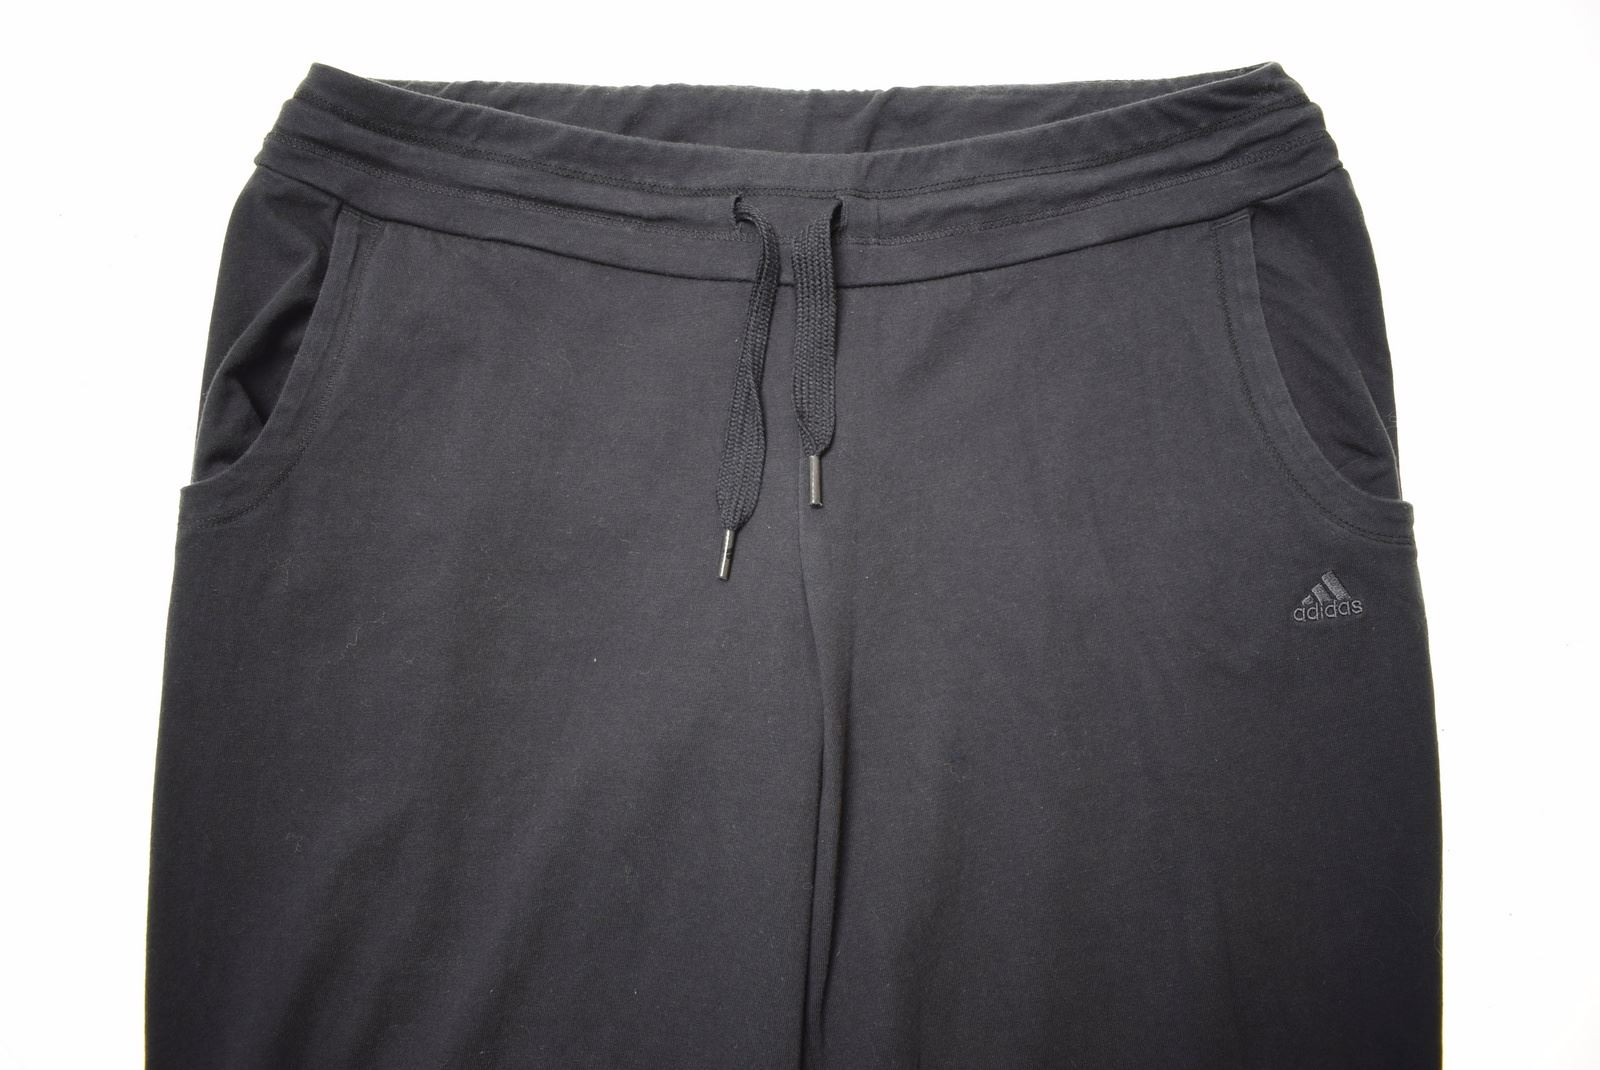 Popular Brand Adidas Womens Tracksuit Trousers Large Black Cotton Vintage Hc04 Activewear